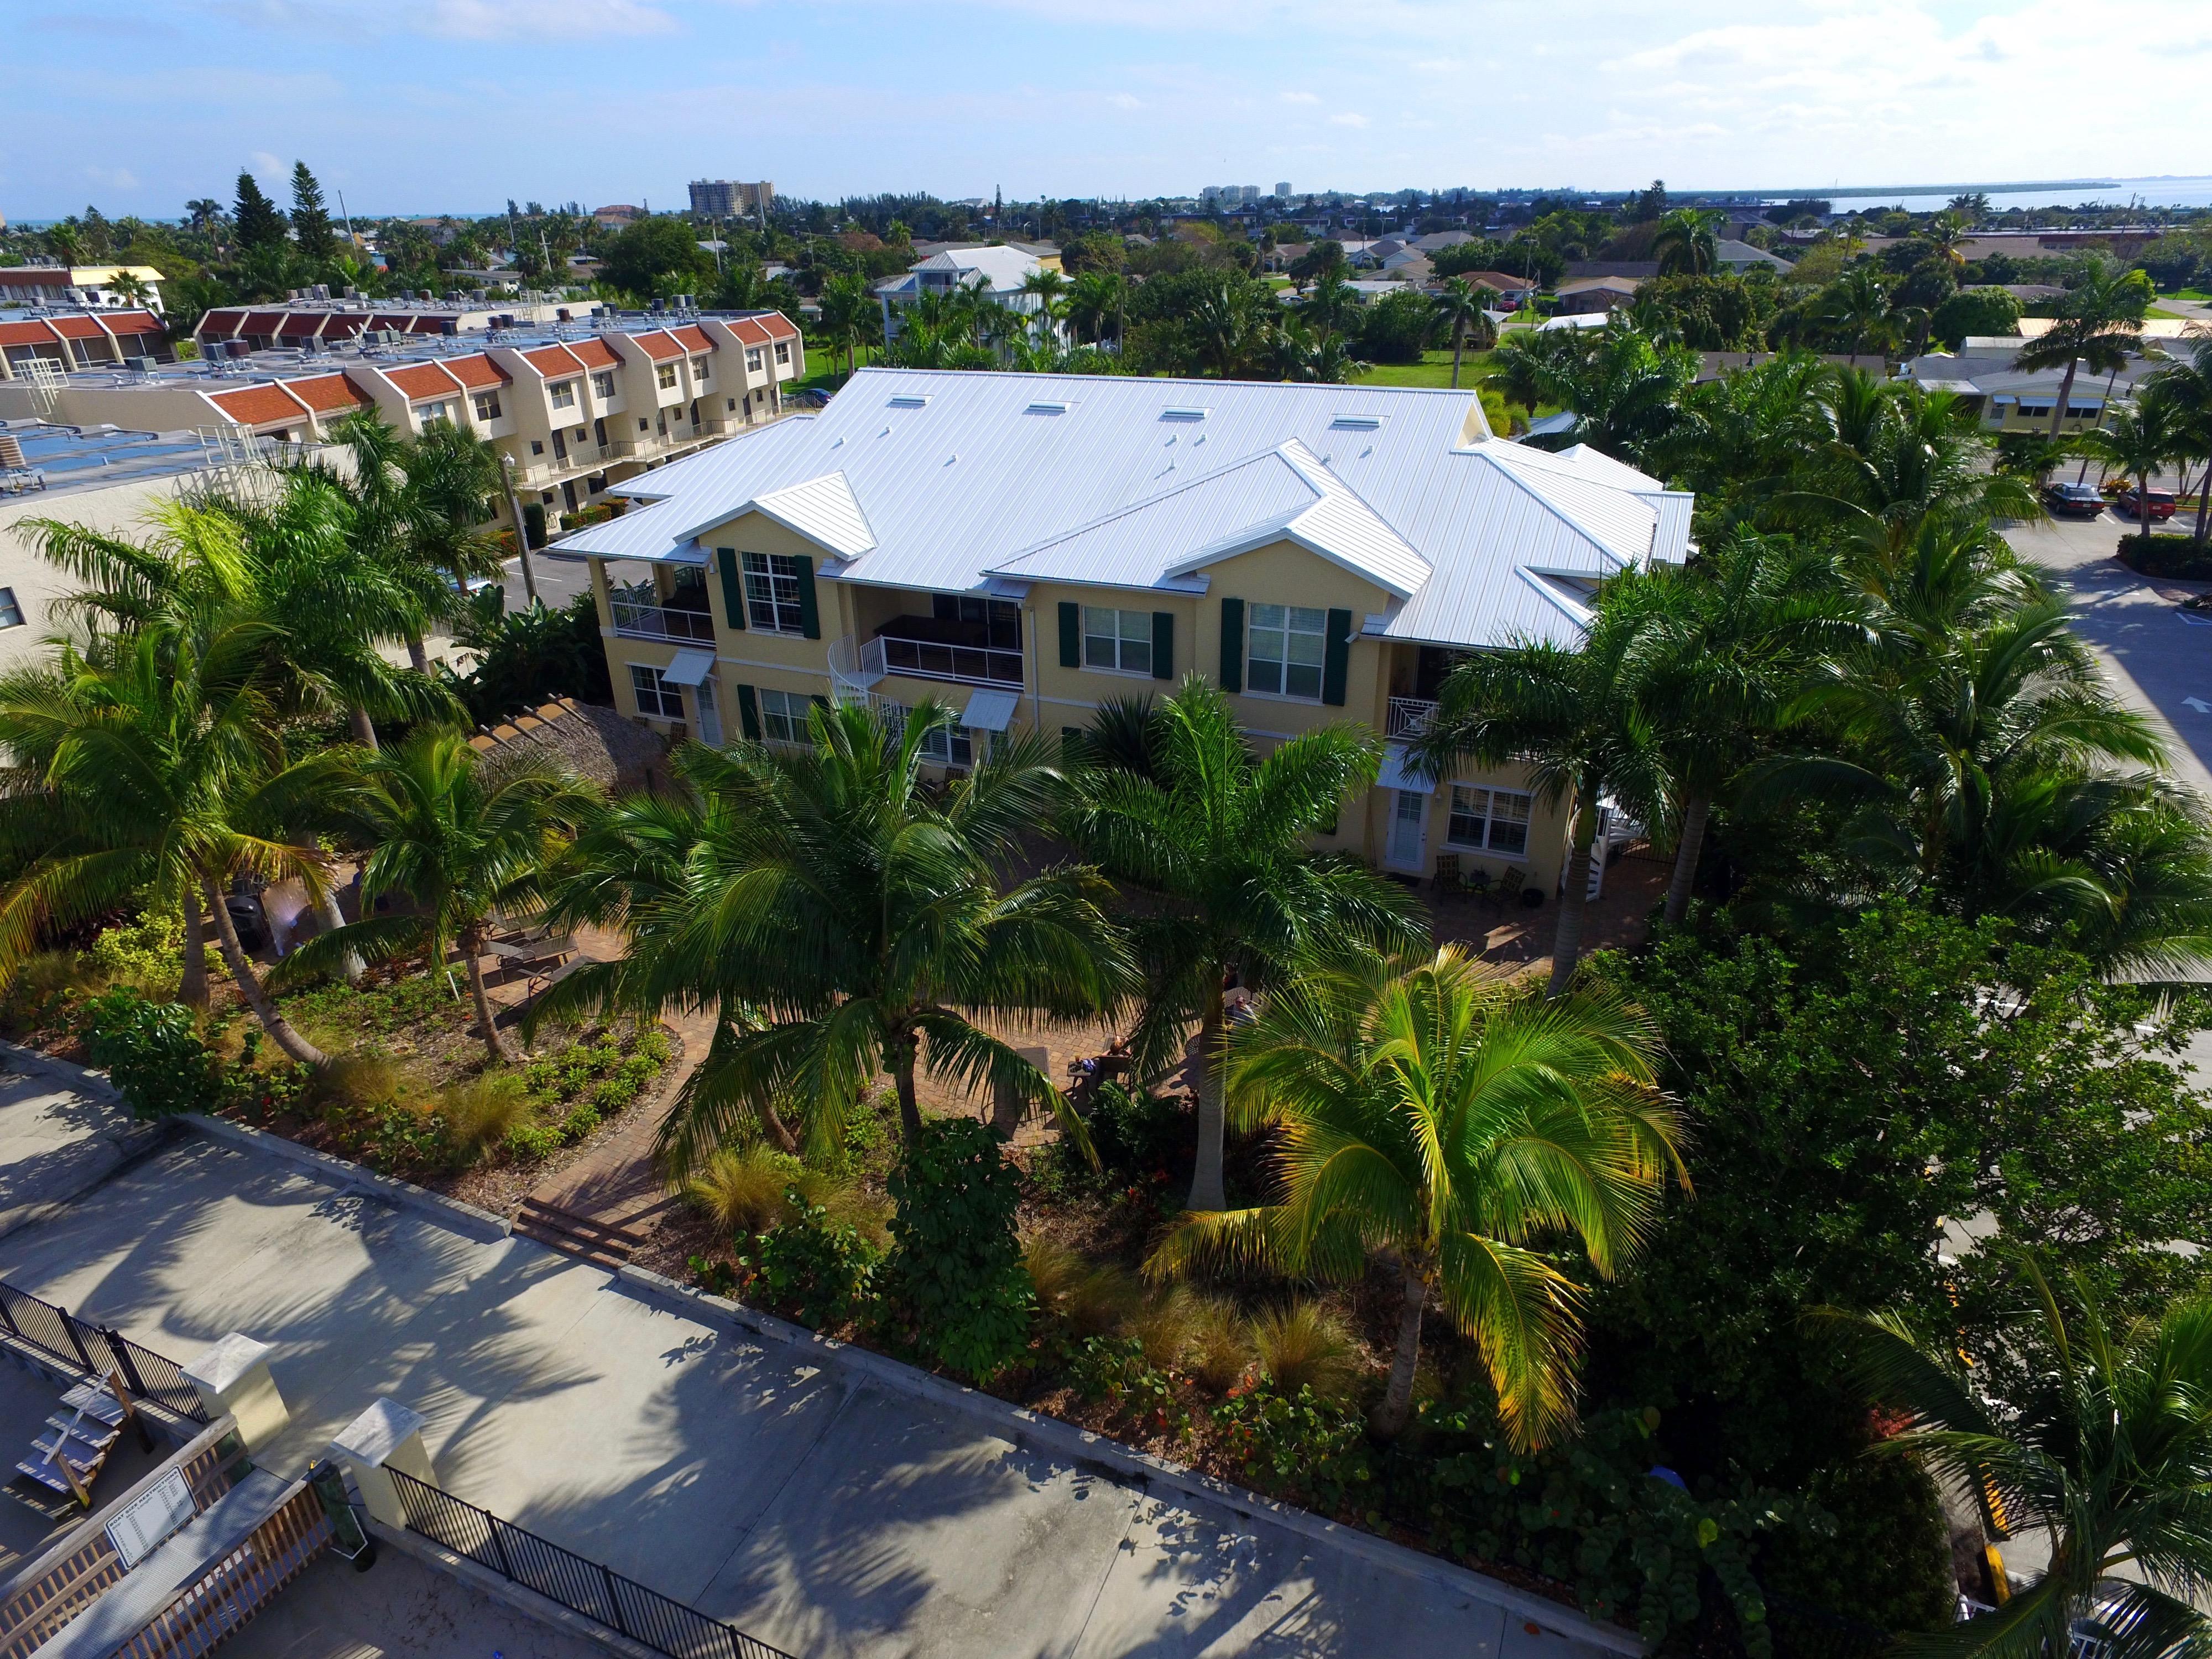 Kiwi Condominium - Hutchinson Island - Oceanside Realty Partners